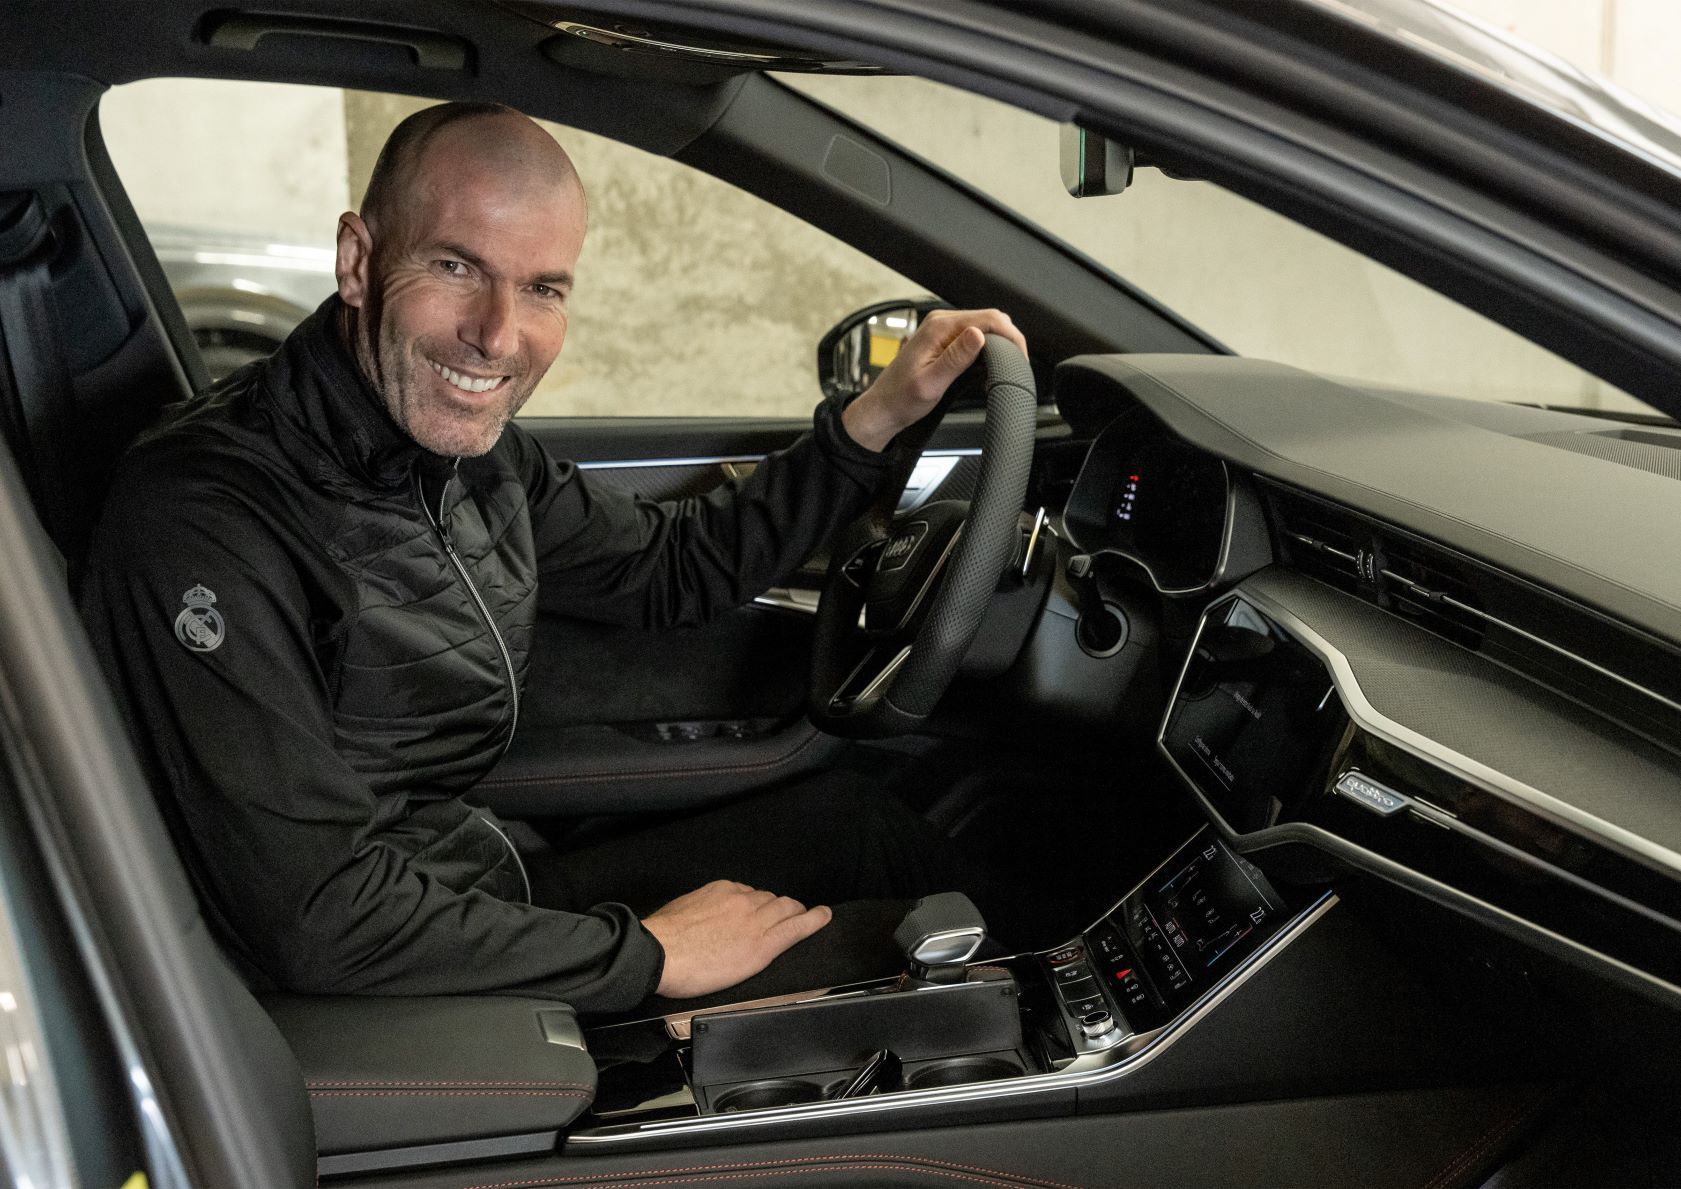 Jugadores del Real Madrid C.F. reciben sus nuevos Audi